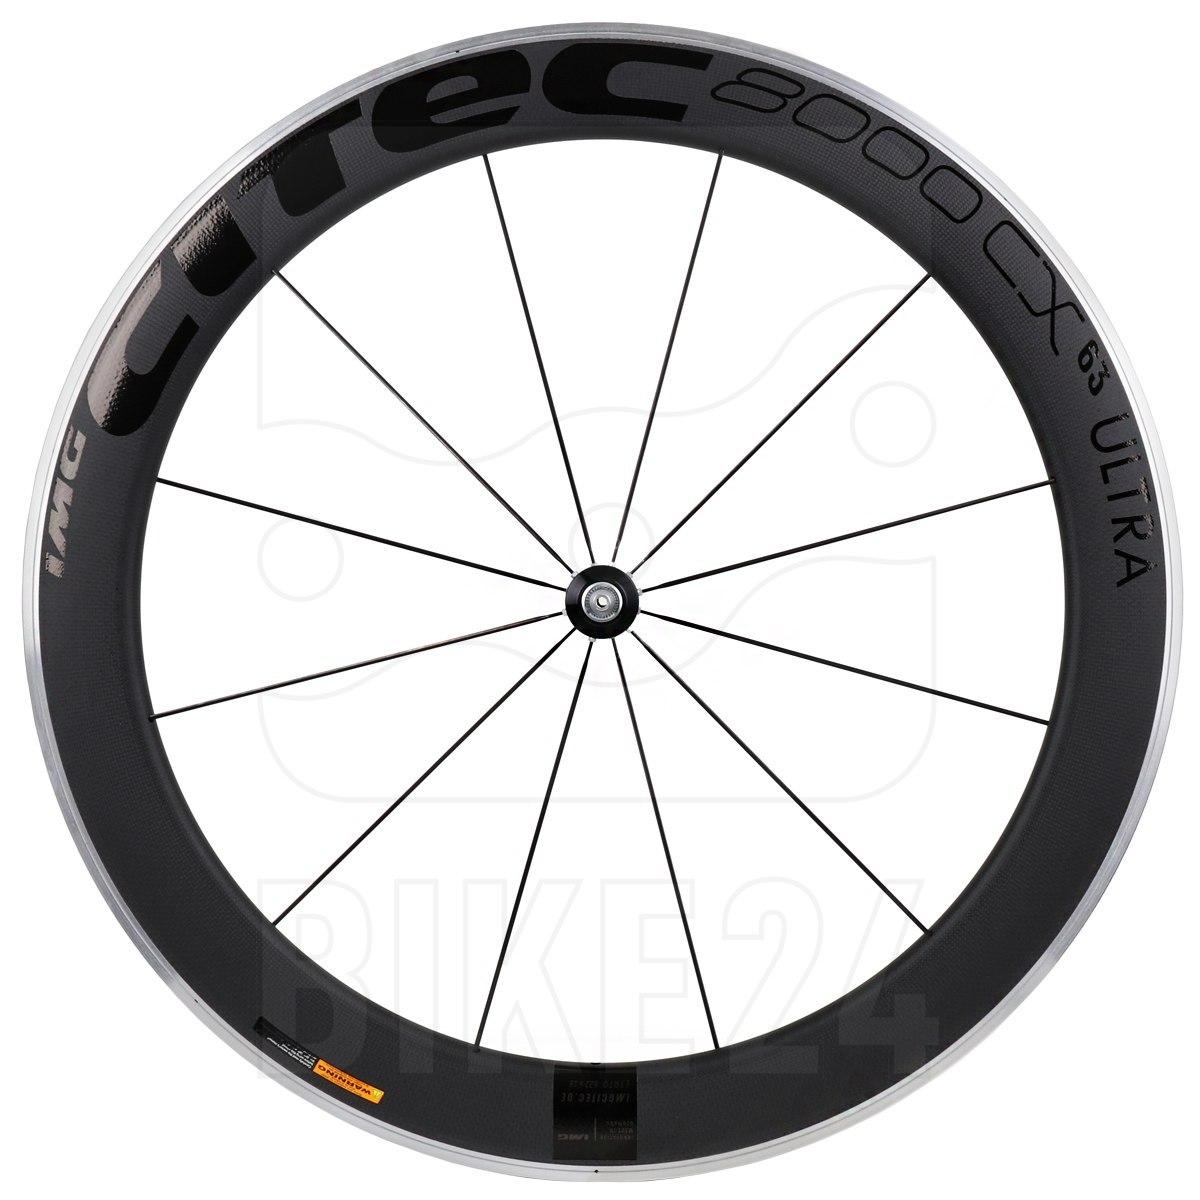 CITEC 8000 CX / 63 Ultra Carbon 28 Inch Front Wheel - Clincher - 9x100mm QR - black